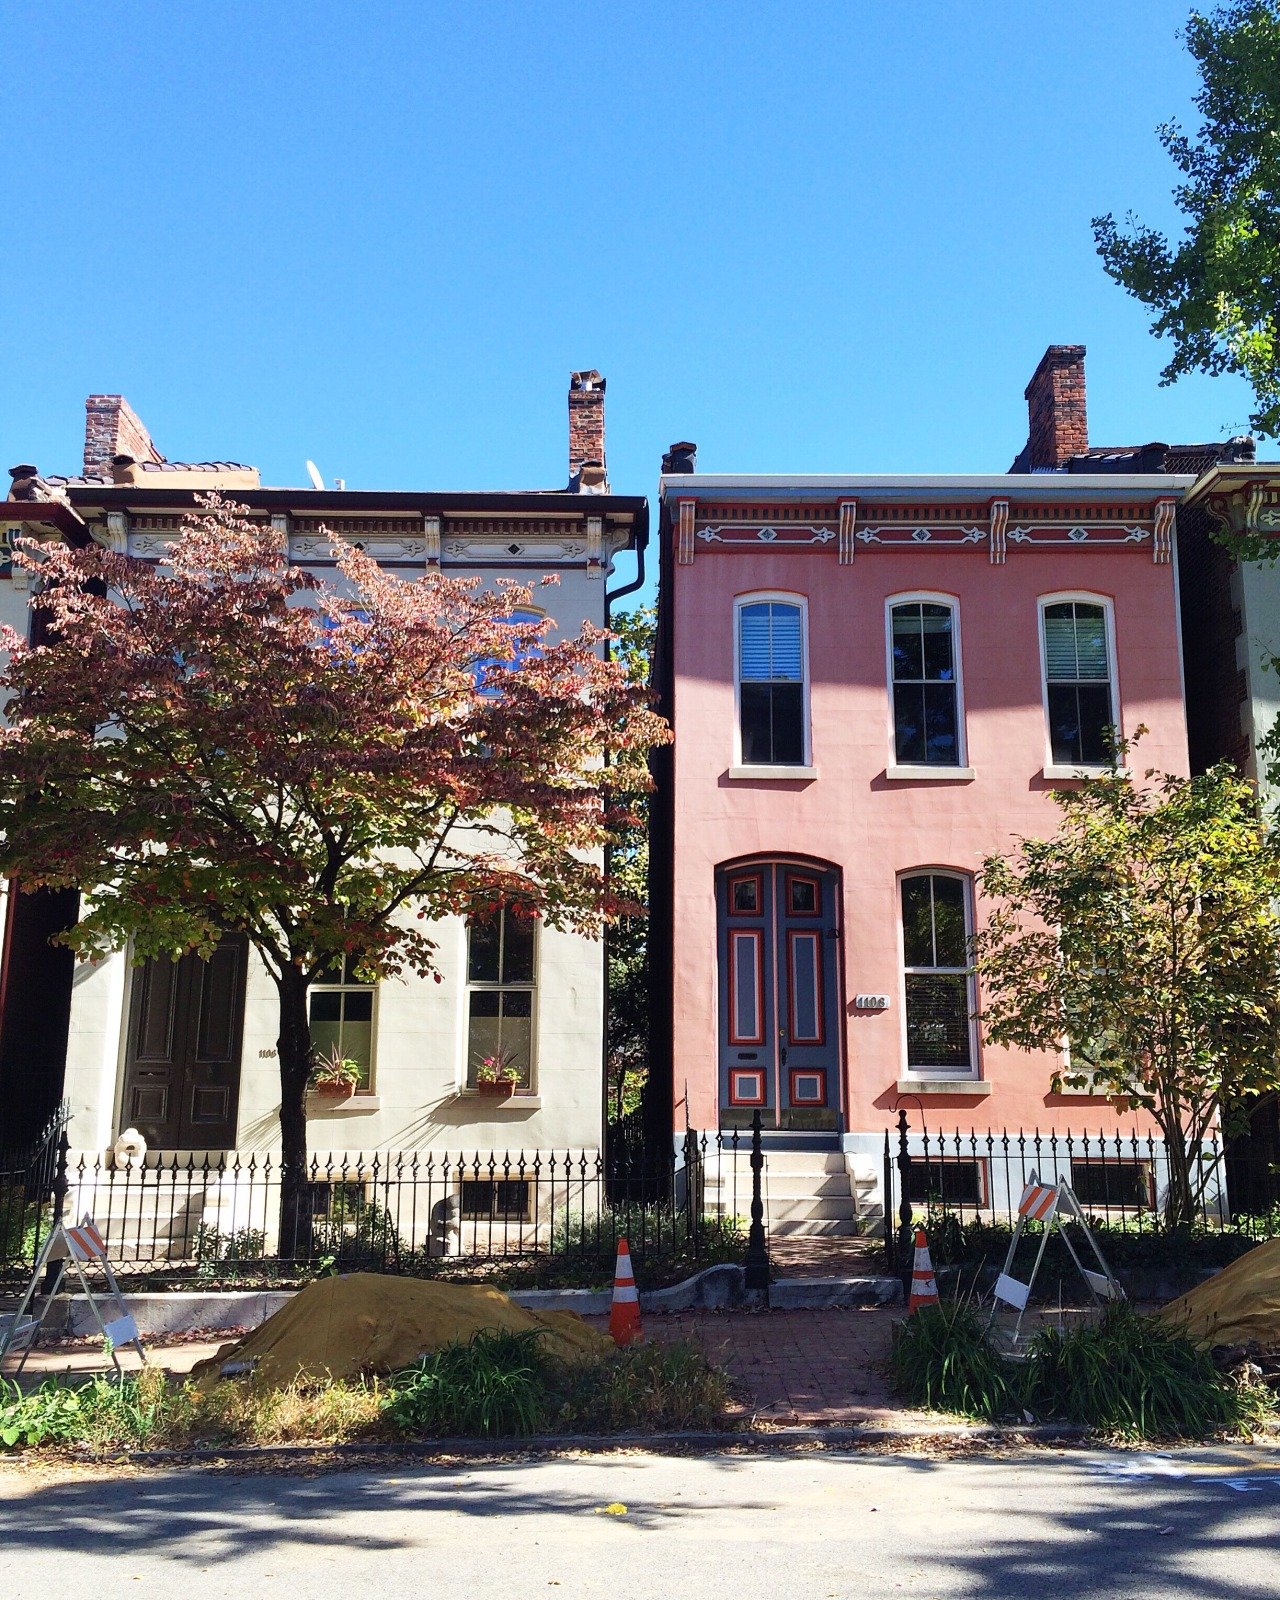 Lafayette Square  St. Louis, Missouri  October 2015